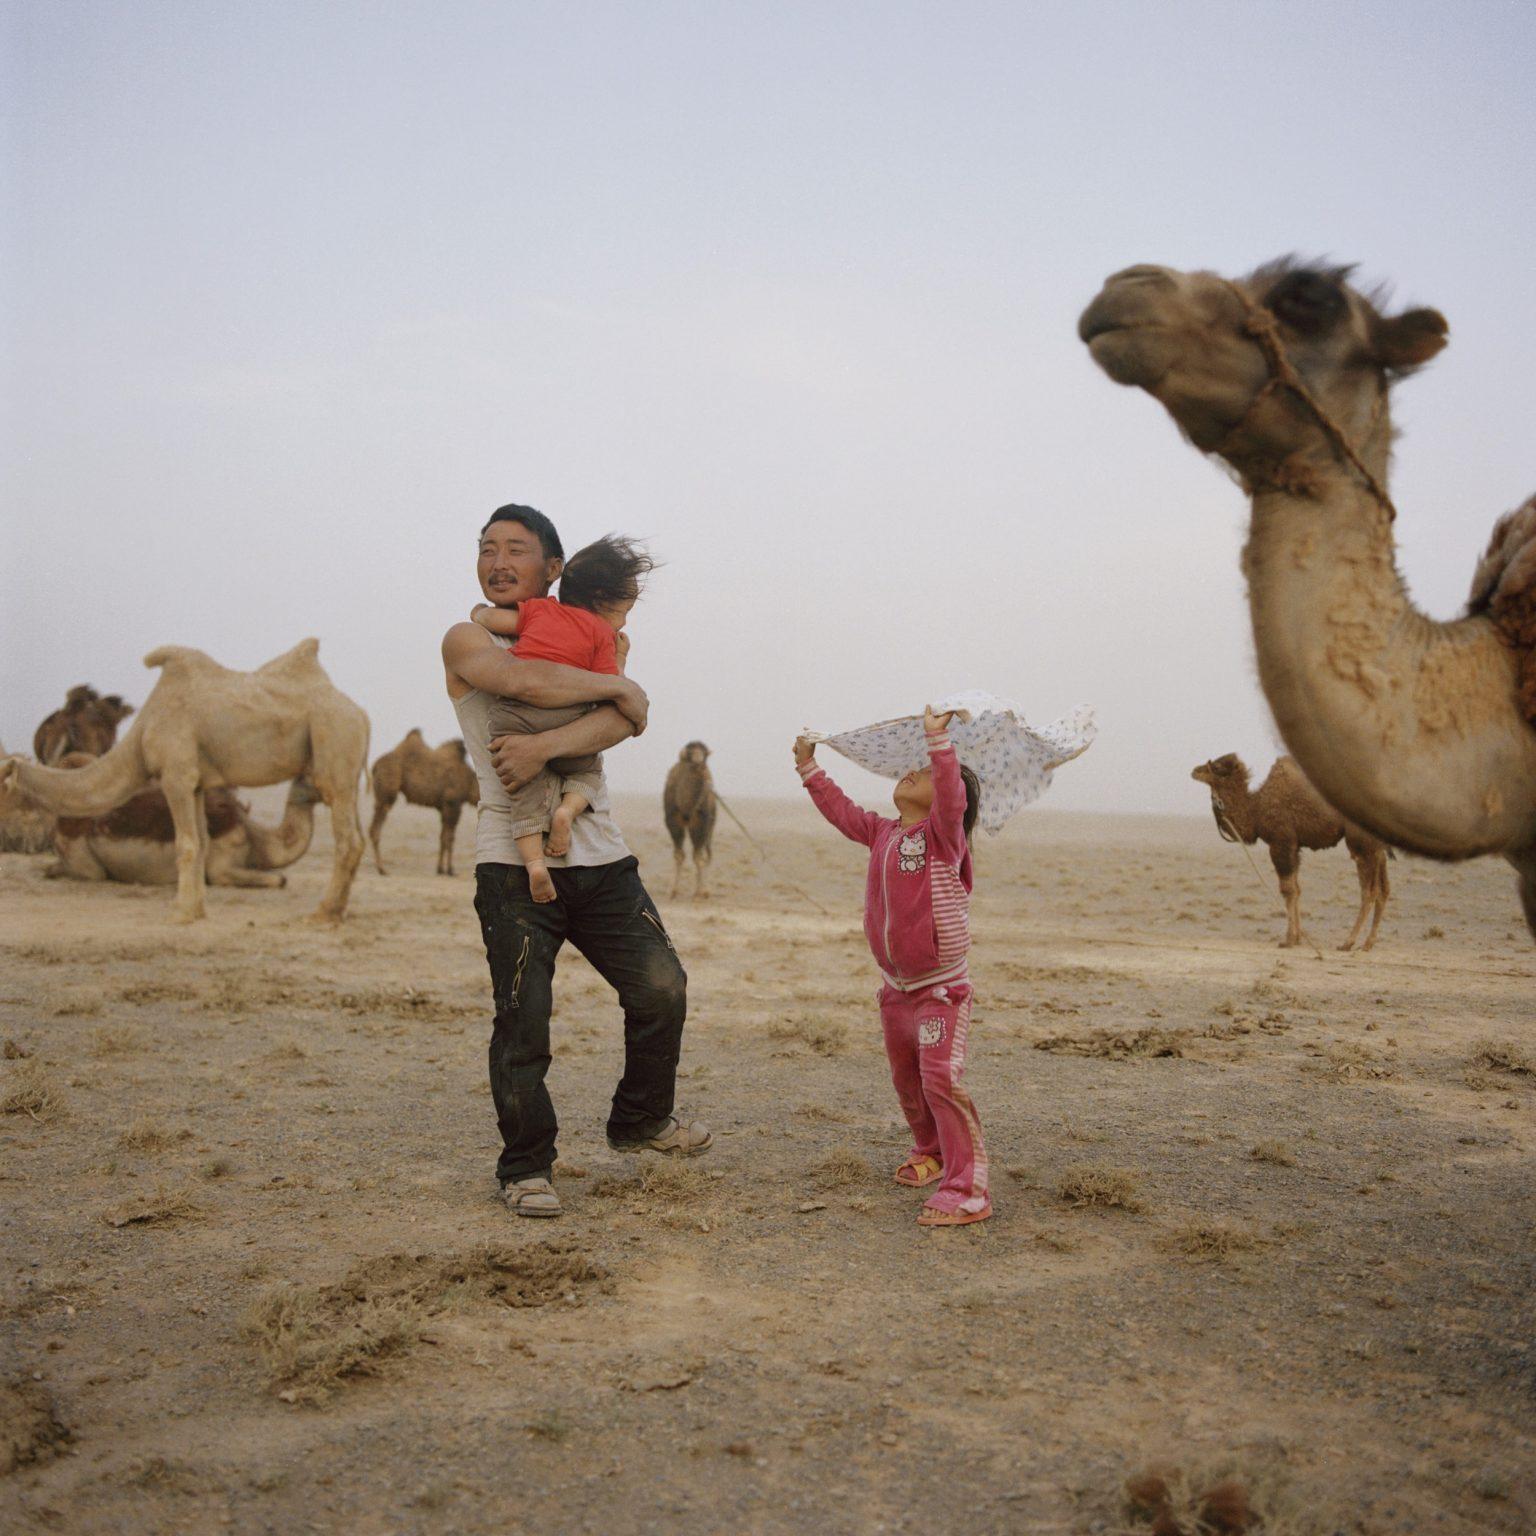 Tuvshinbayar Sugirsuren with his children during a sand storm. Omongovi, 2012